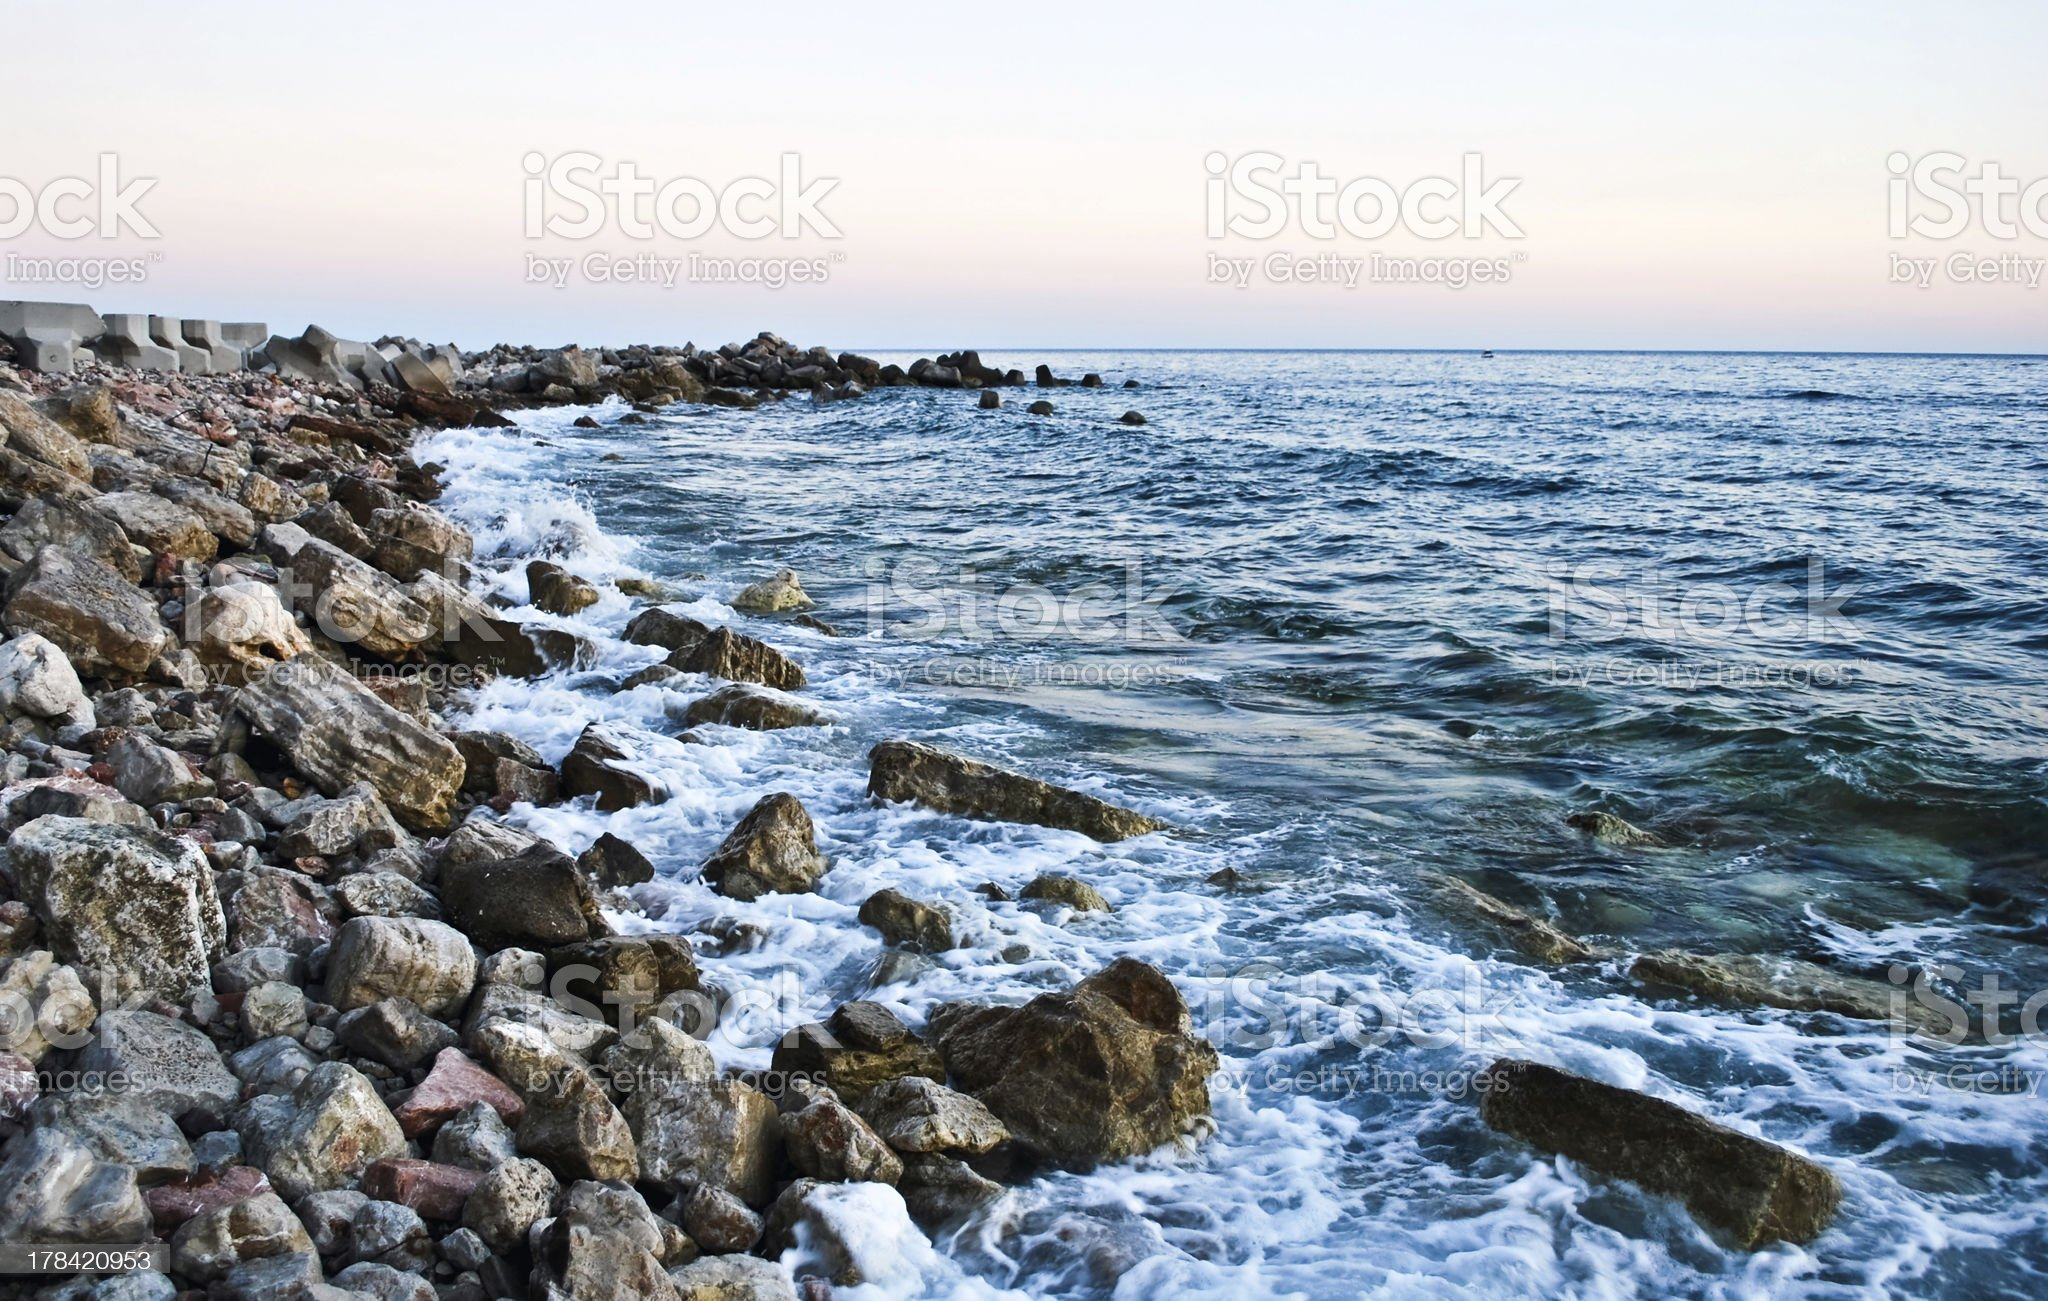 Stones on the Beach royalty-free stock photo